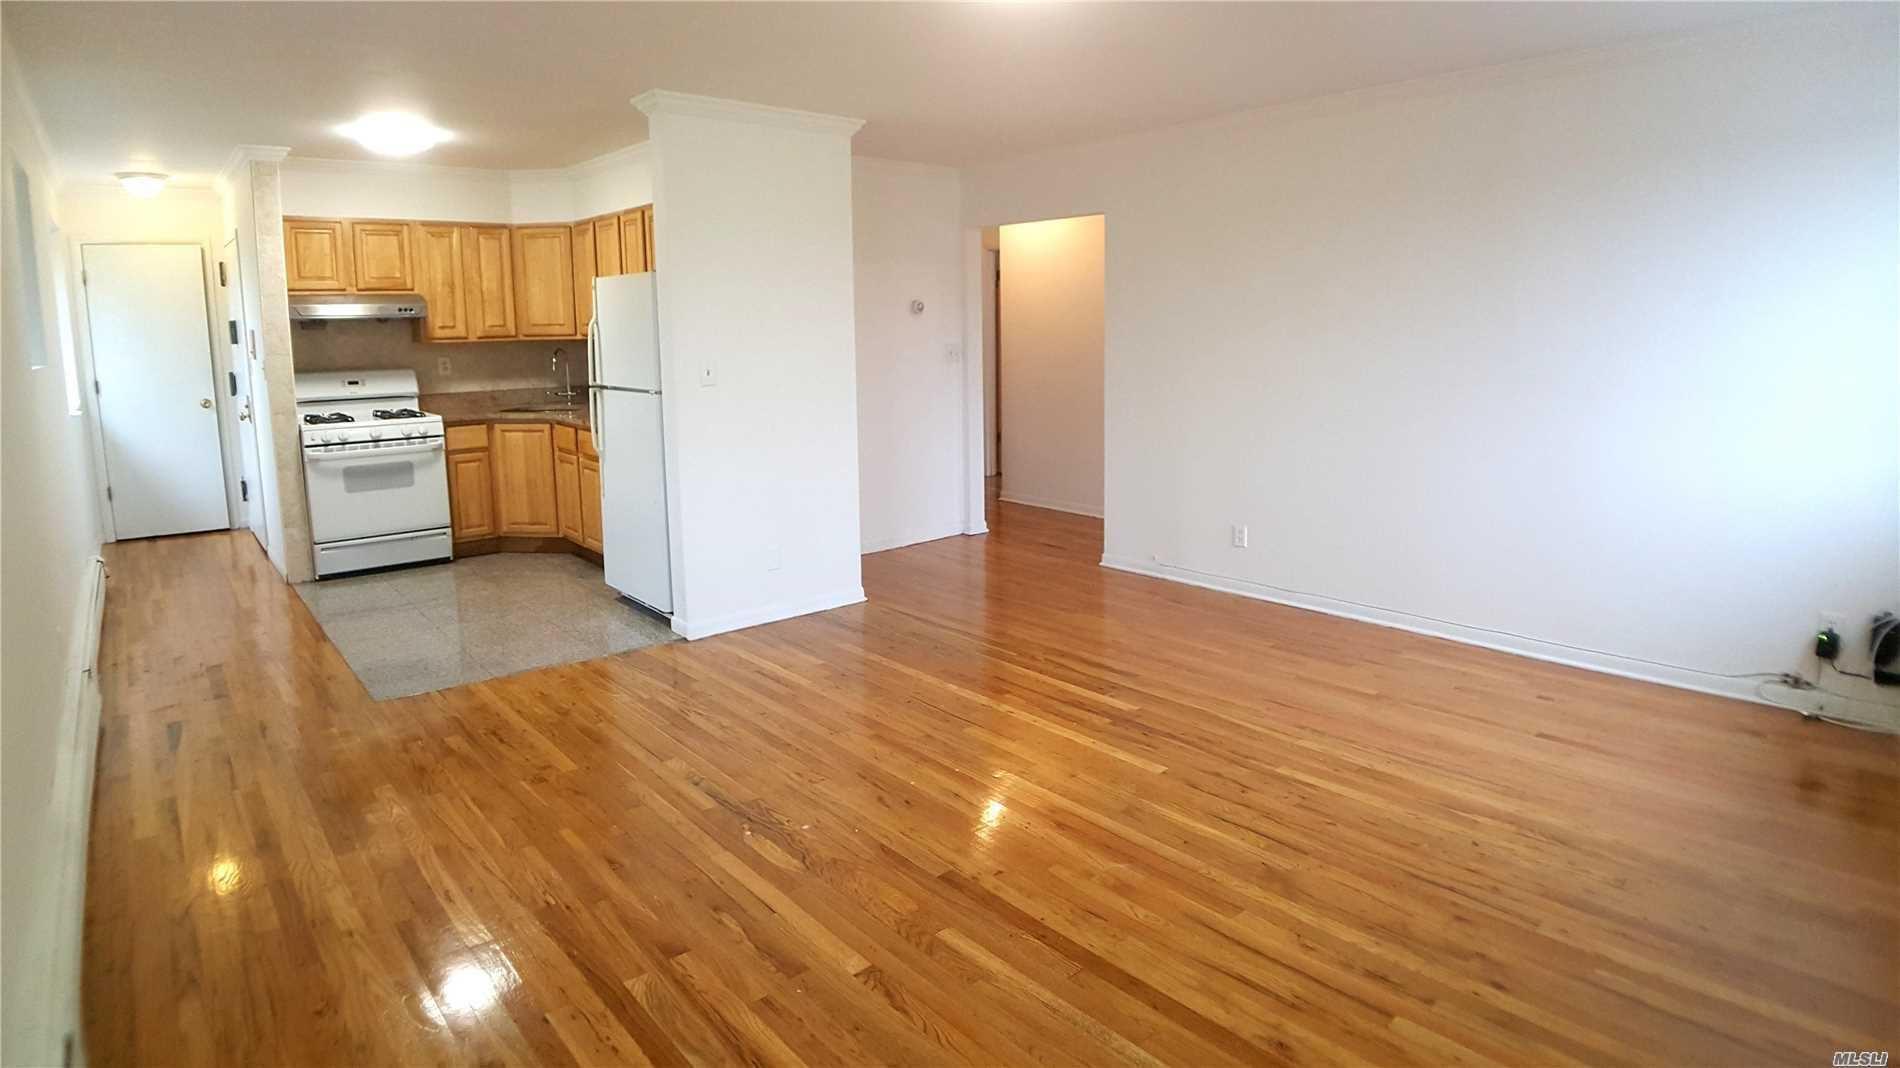 81-64 102nd Avenue #3rd Fl, Ozone Park, NY 11416 - MLS#: 3240748